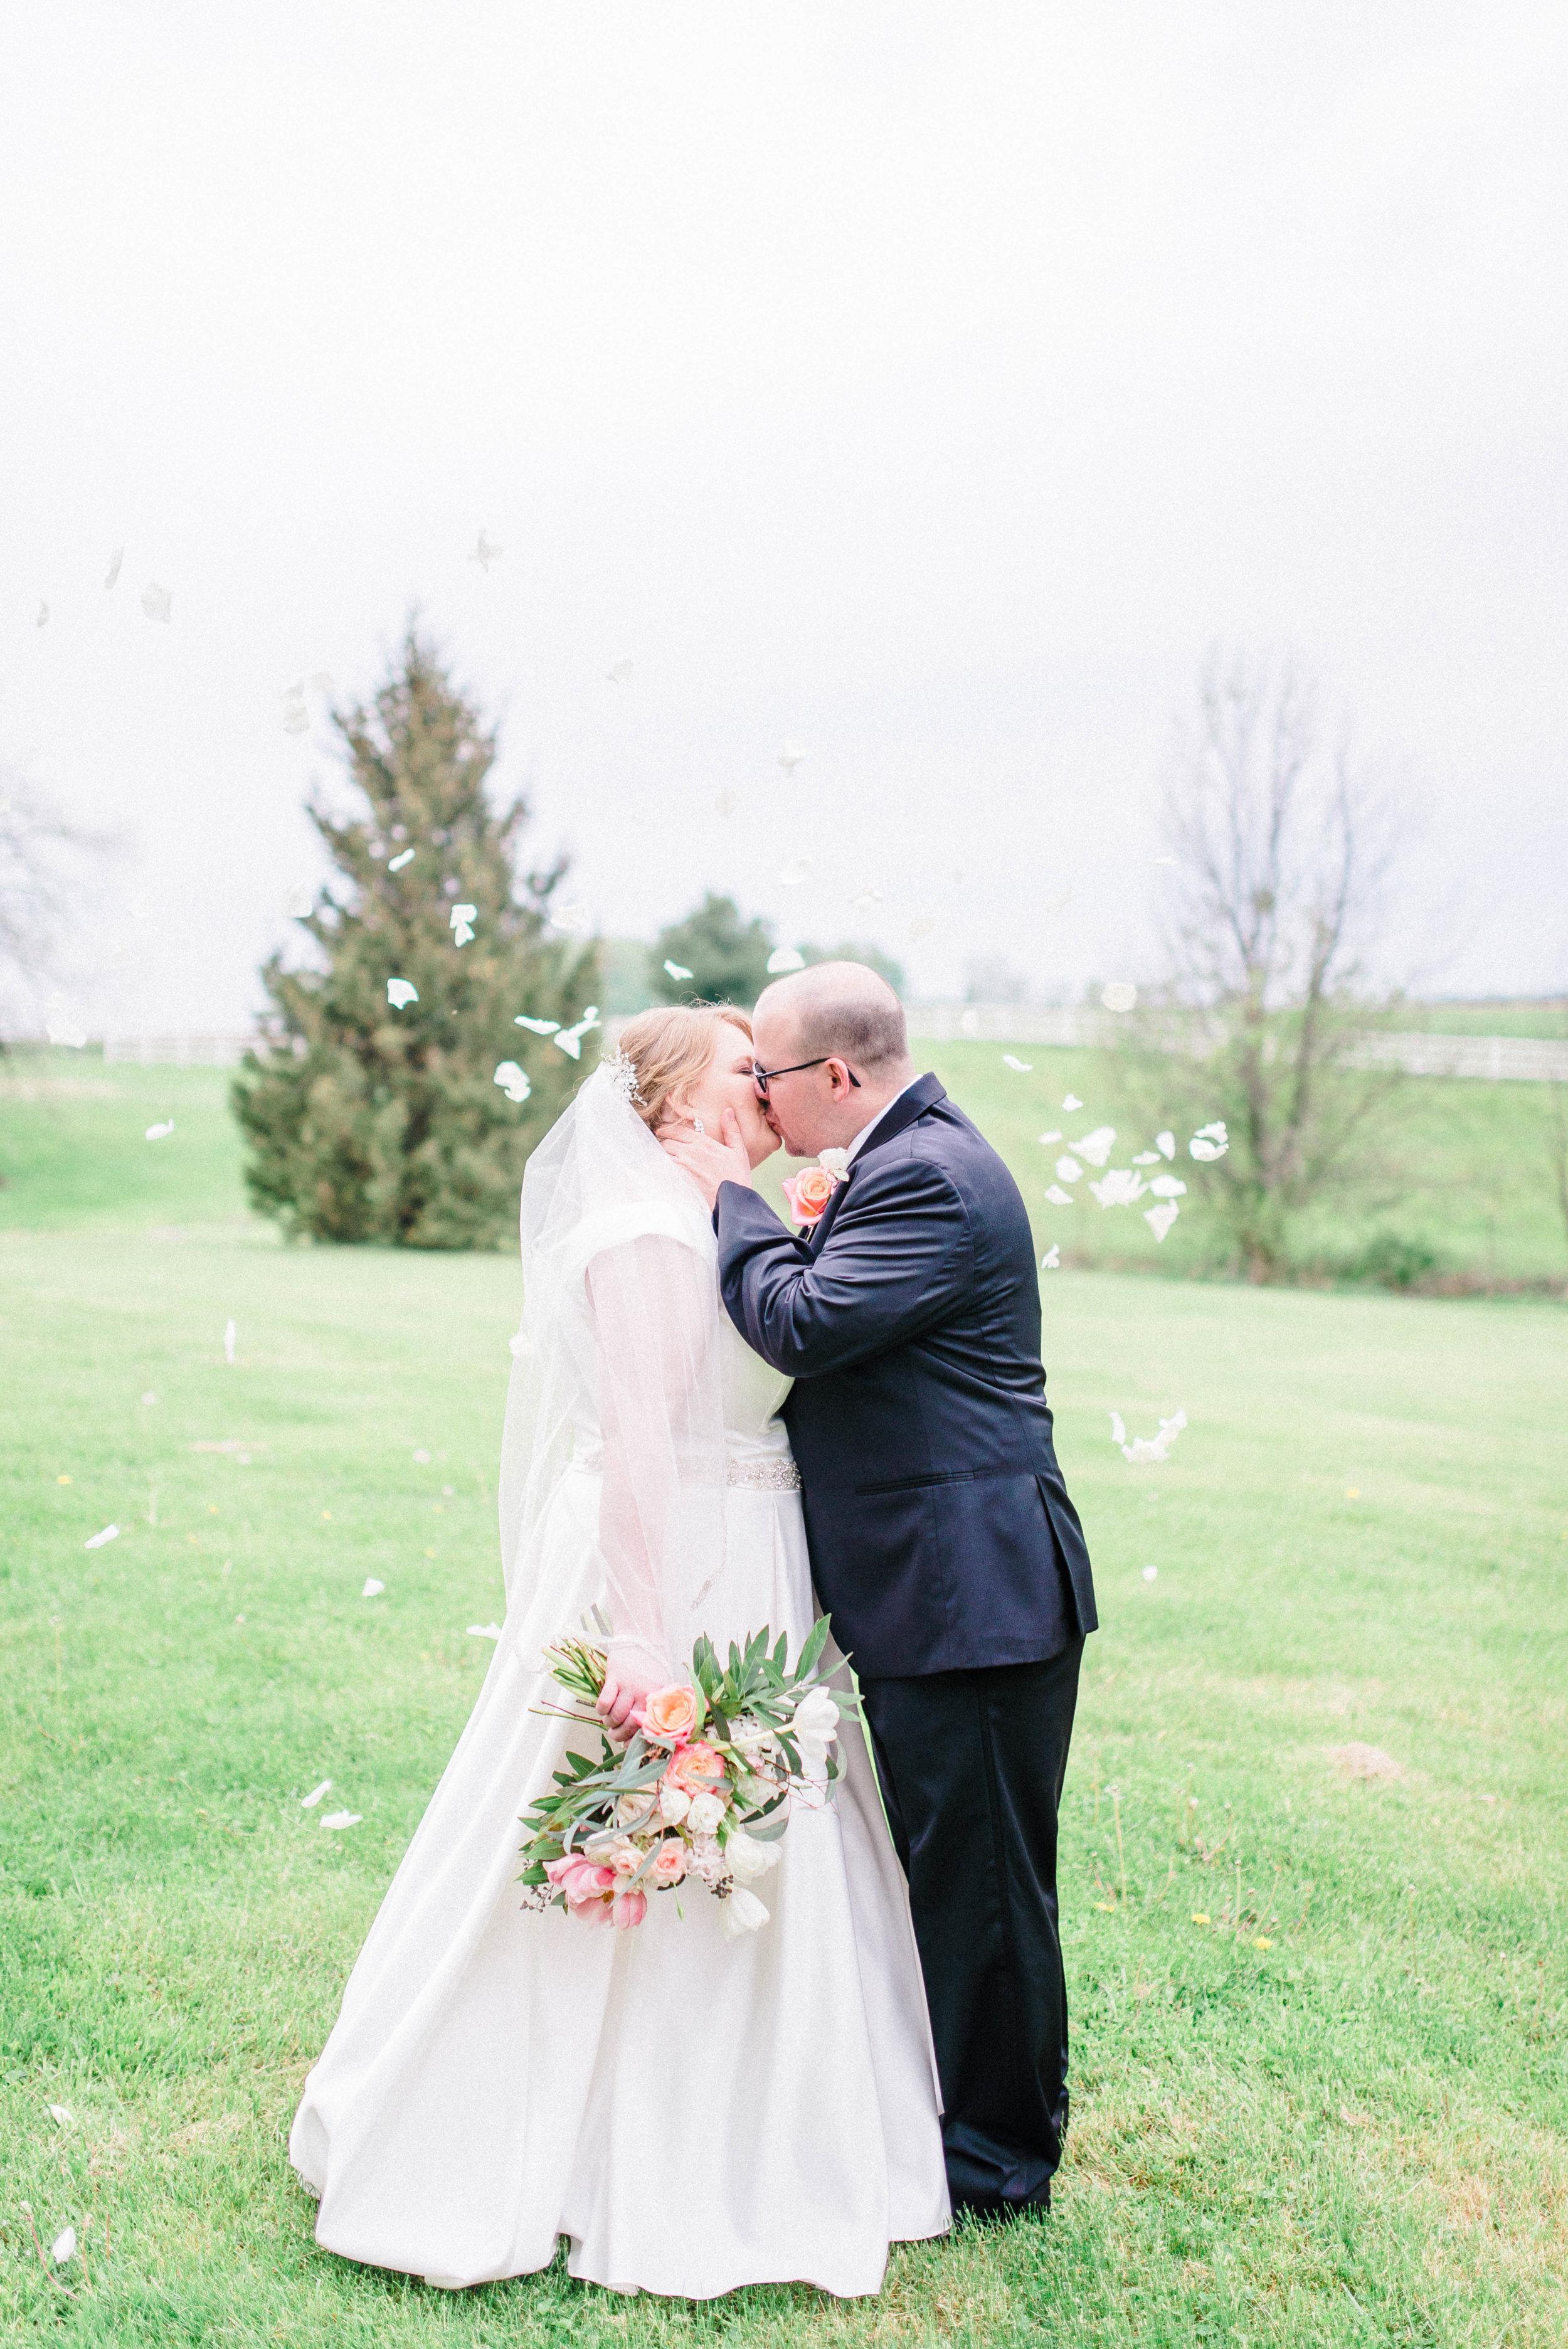 Romantic, Simplistic & Organic Wedding on an Alpaca Farm in Indiana | Color Scheme of Dusty Blue, Blush Pink and Soft White Tones | Indianapolis Destination Wedding & Elopement Photographer | Katerina Marie Photography - www.katmariepad.com